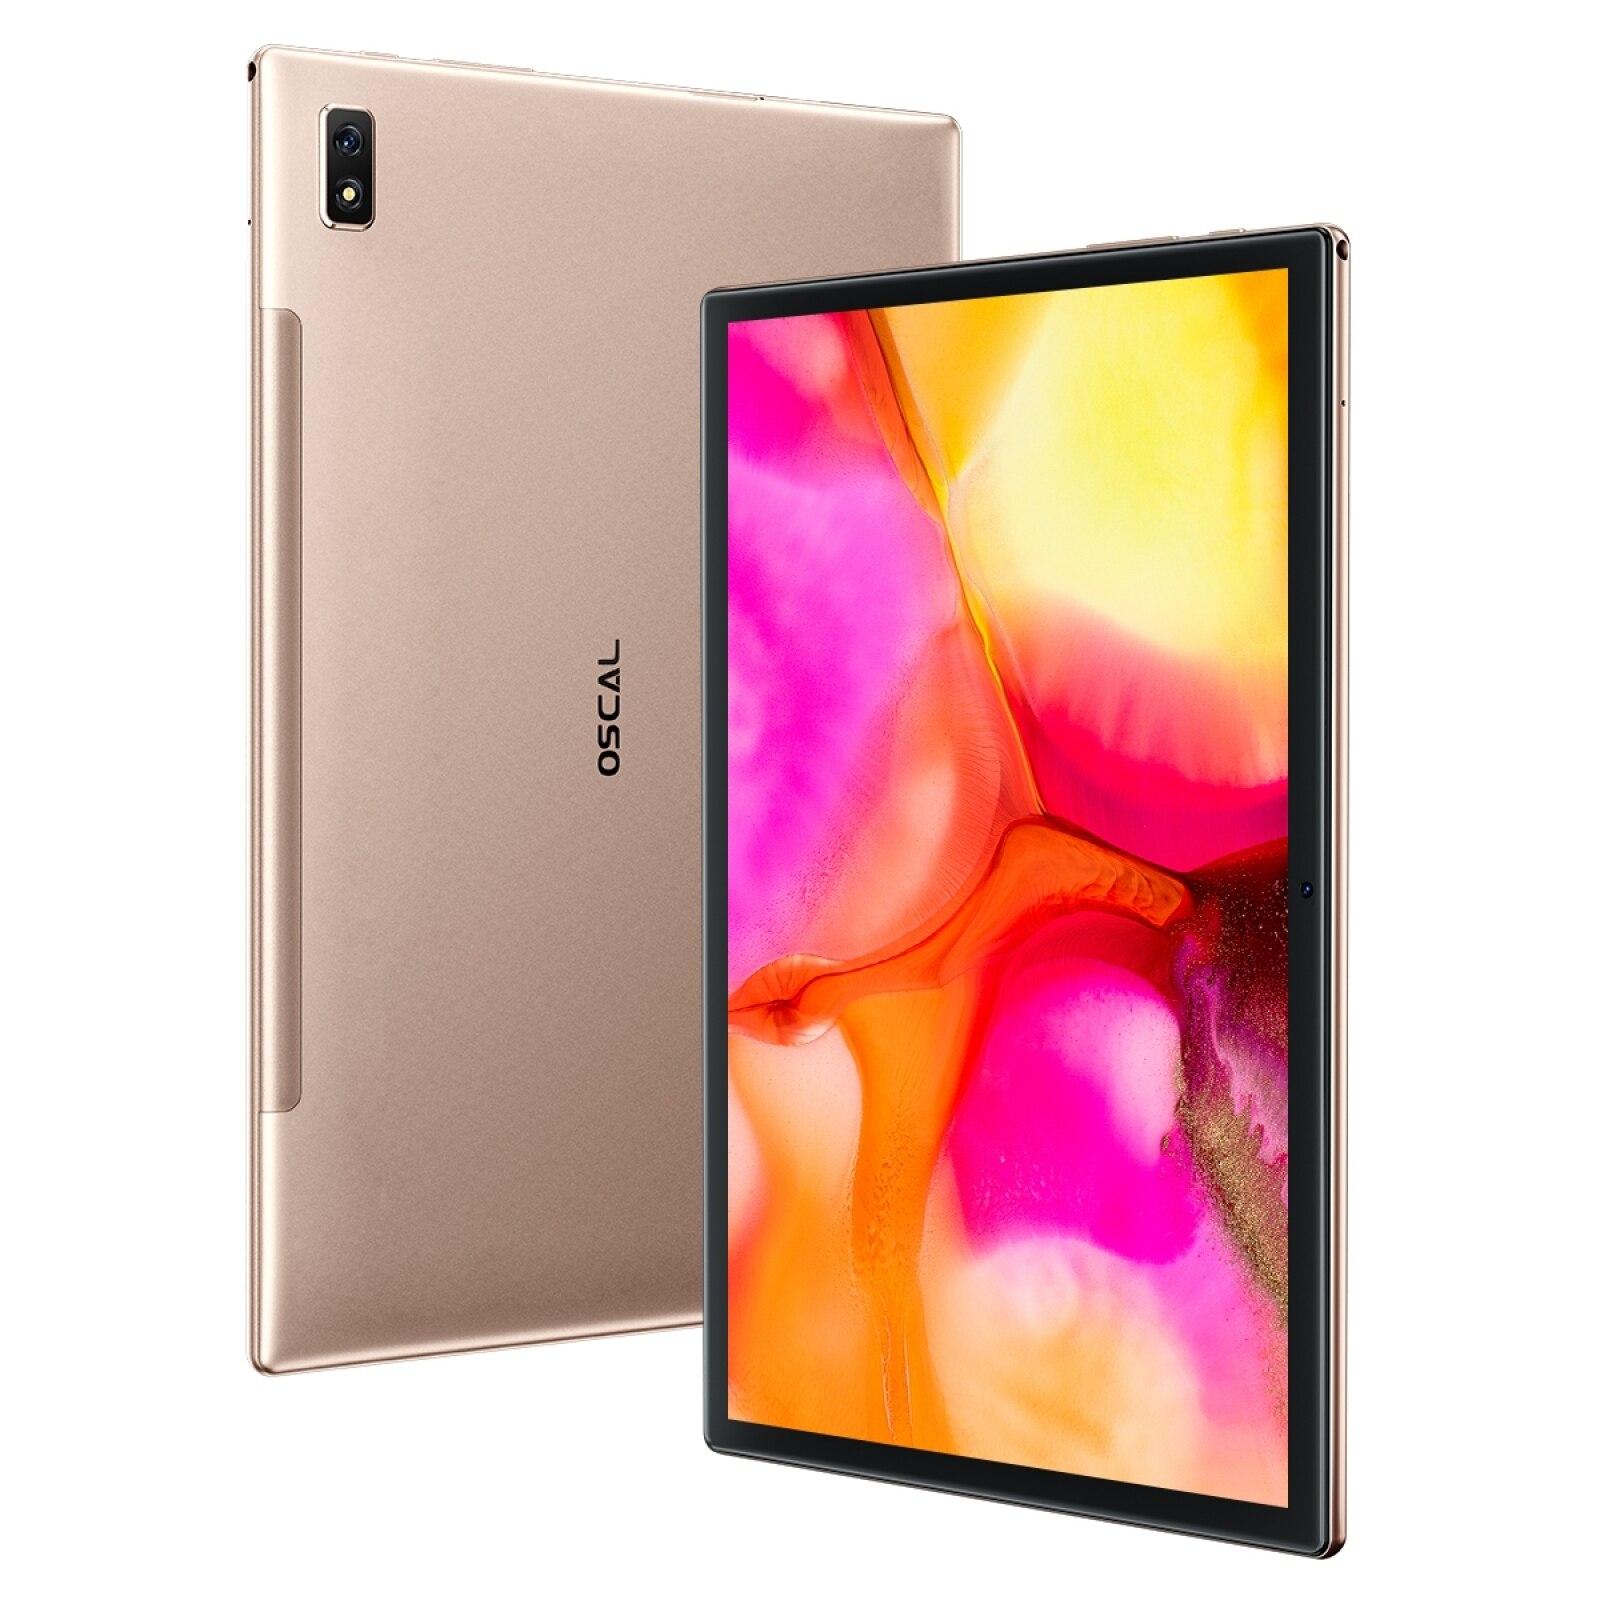 "Blackview oscal almofada 8 android 11 tablet pc 10.1 ""4gb + 64gb sc9863a octa núcleo 1.6ghz 5mp sim duplo 4g & wifi & bluetooth 6580mah"